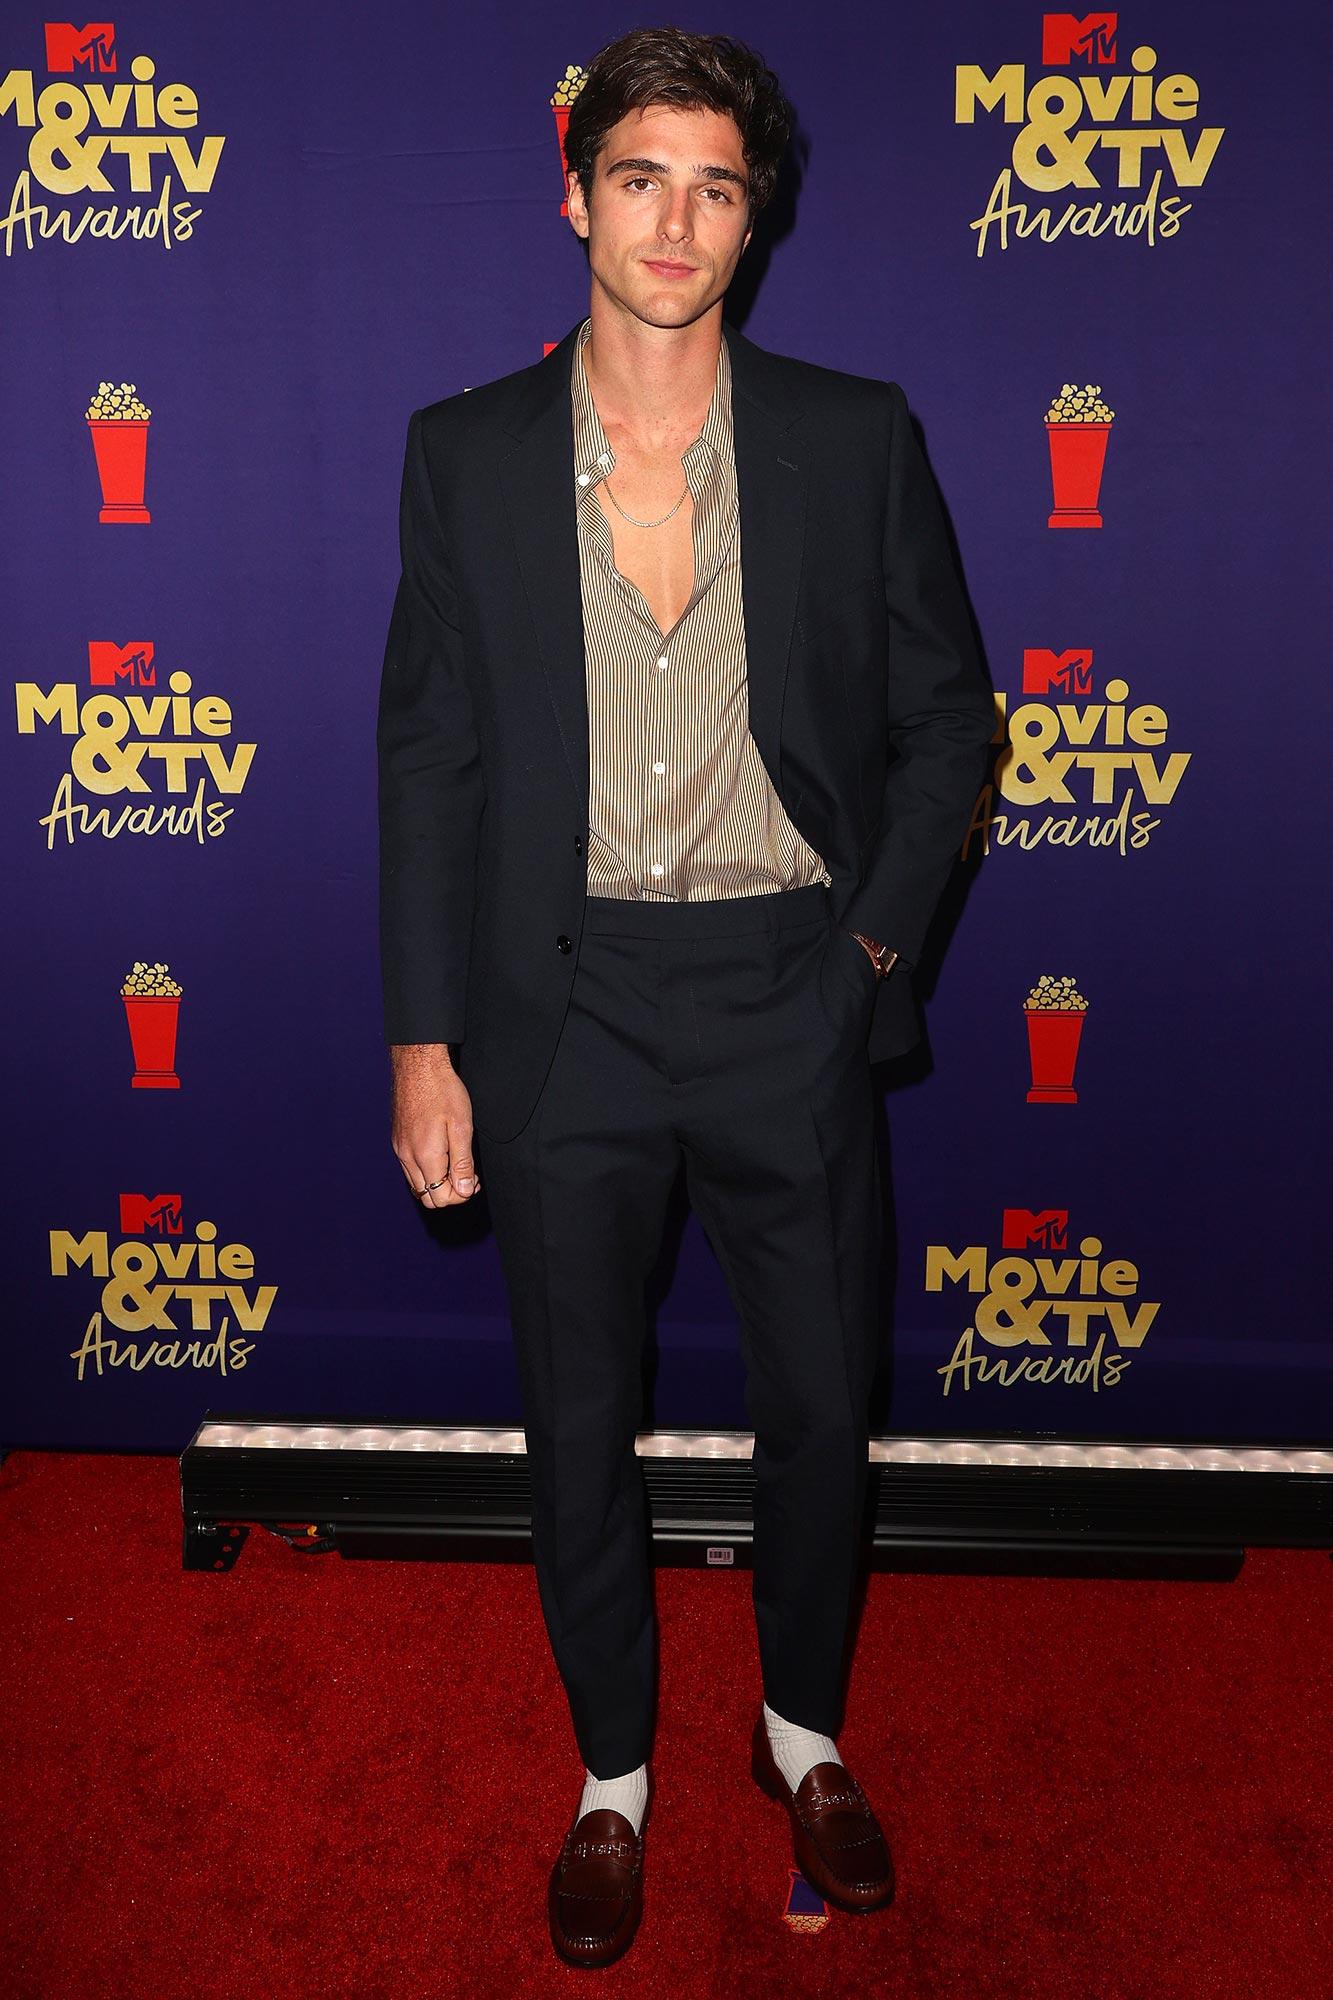 MTV Movie & TV Awards Jacob Elordi